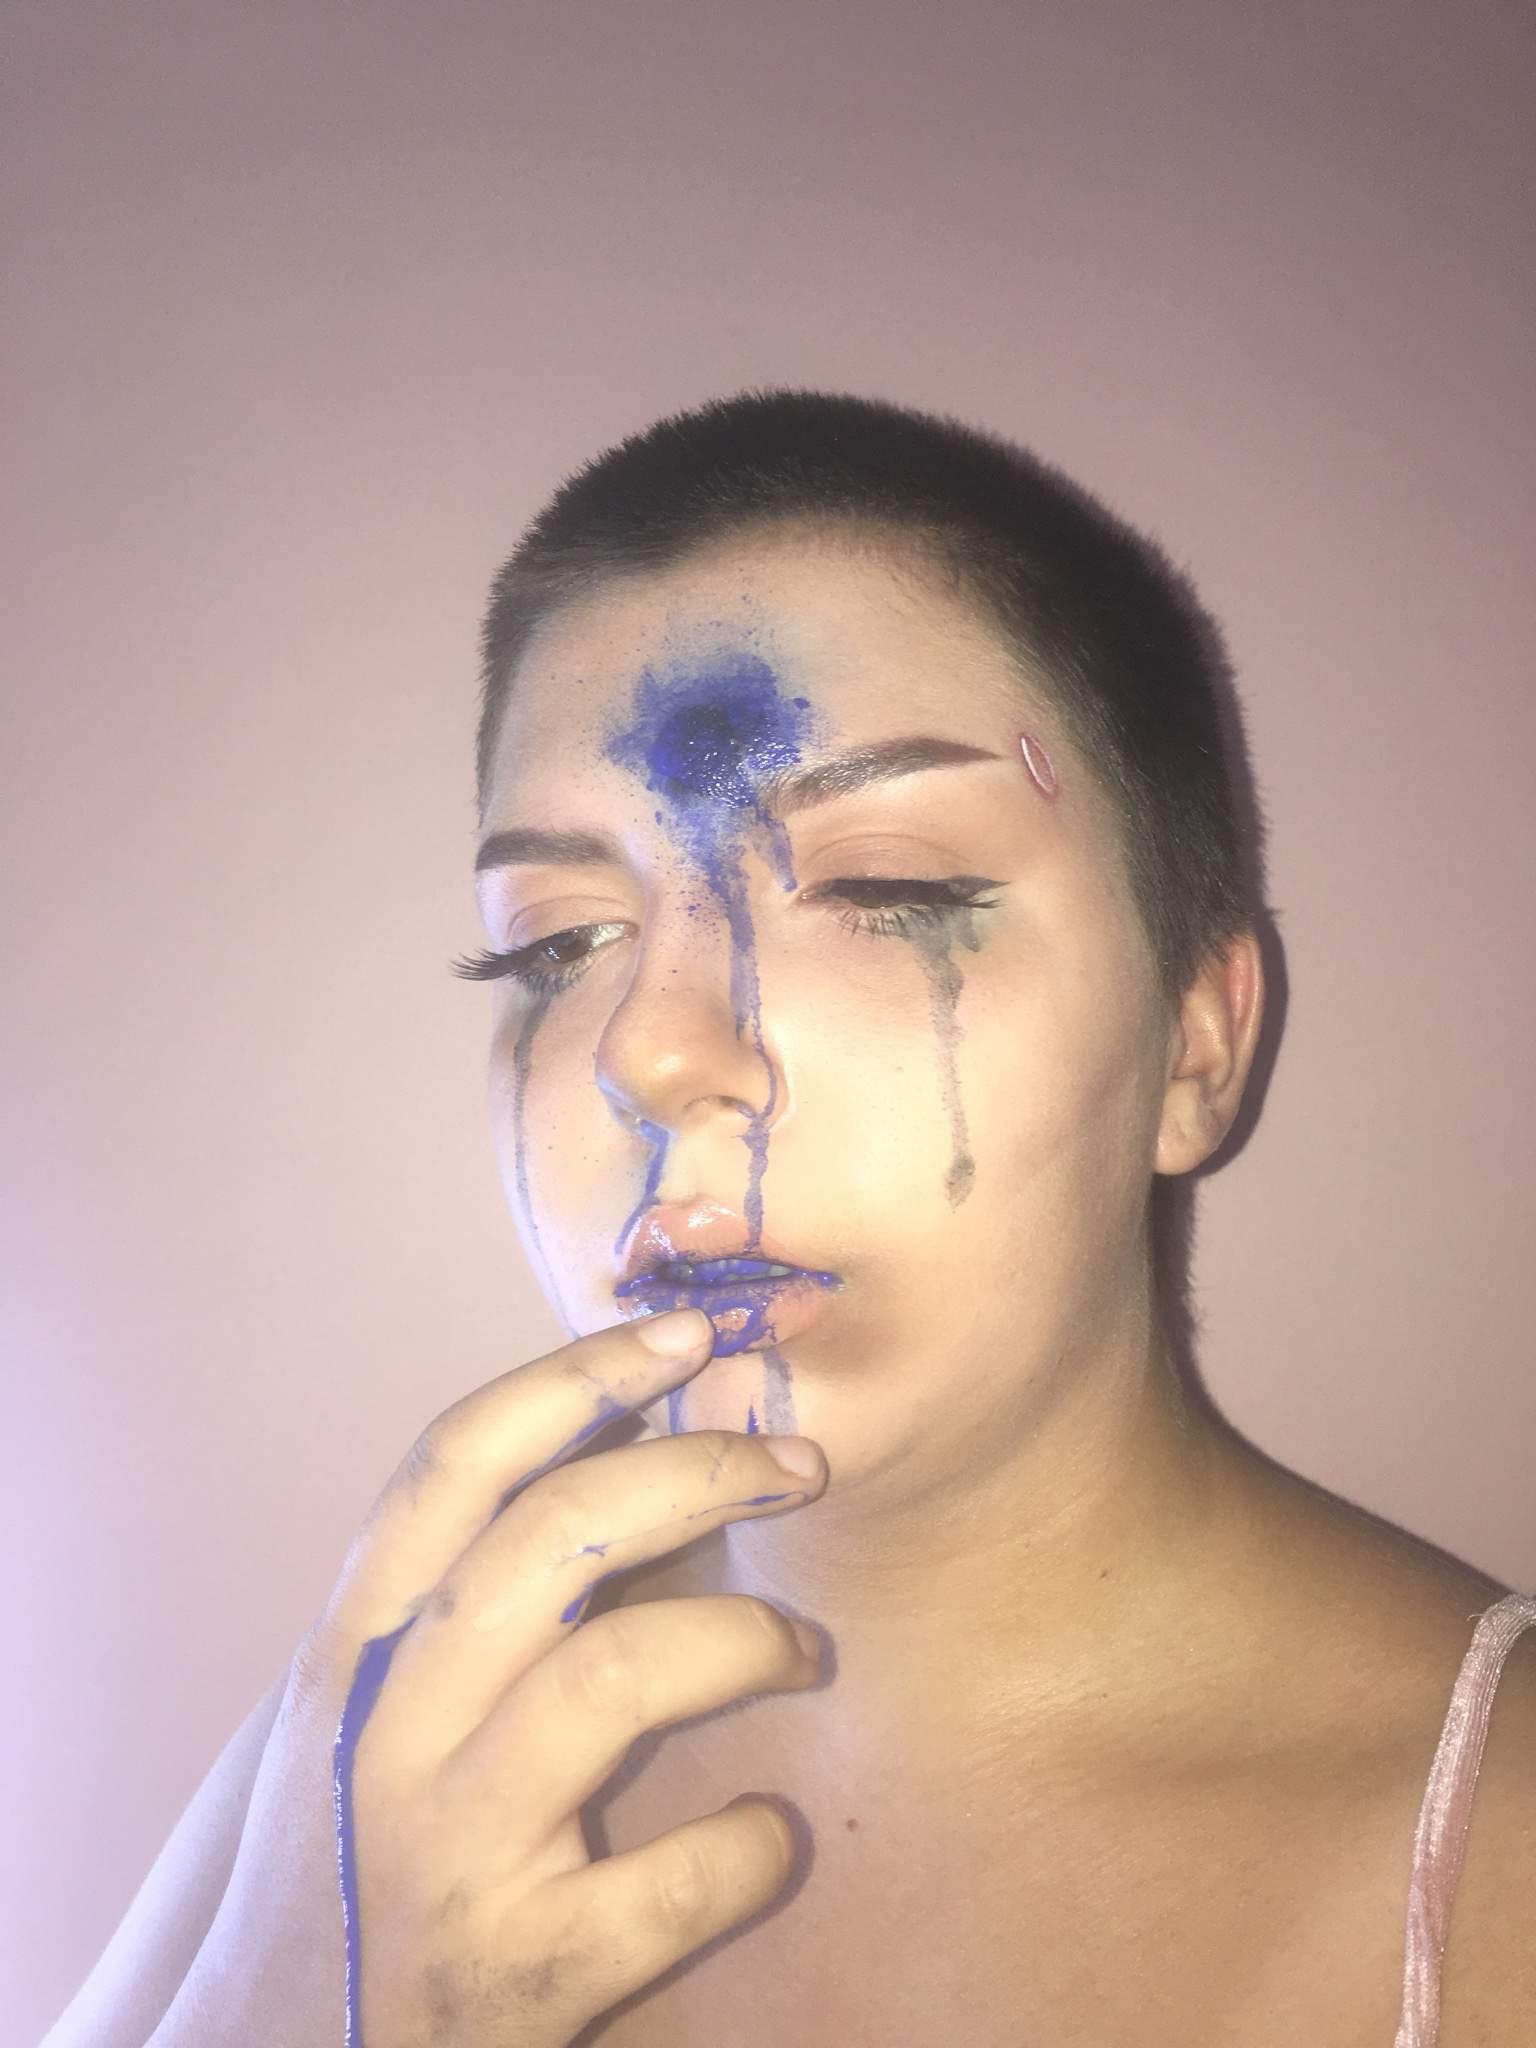 Some Emo Makeup Detroit Become Human